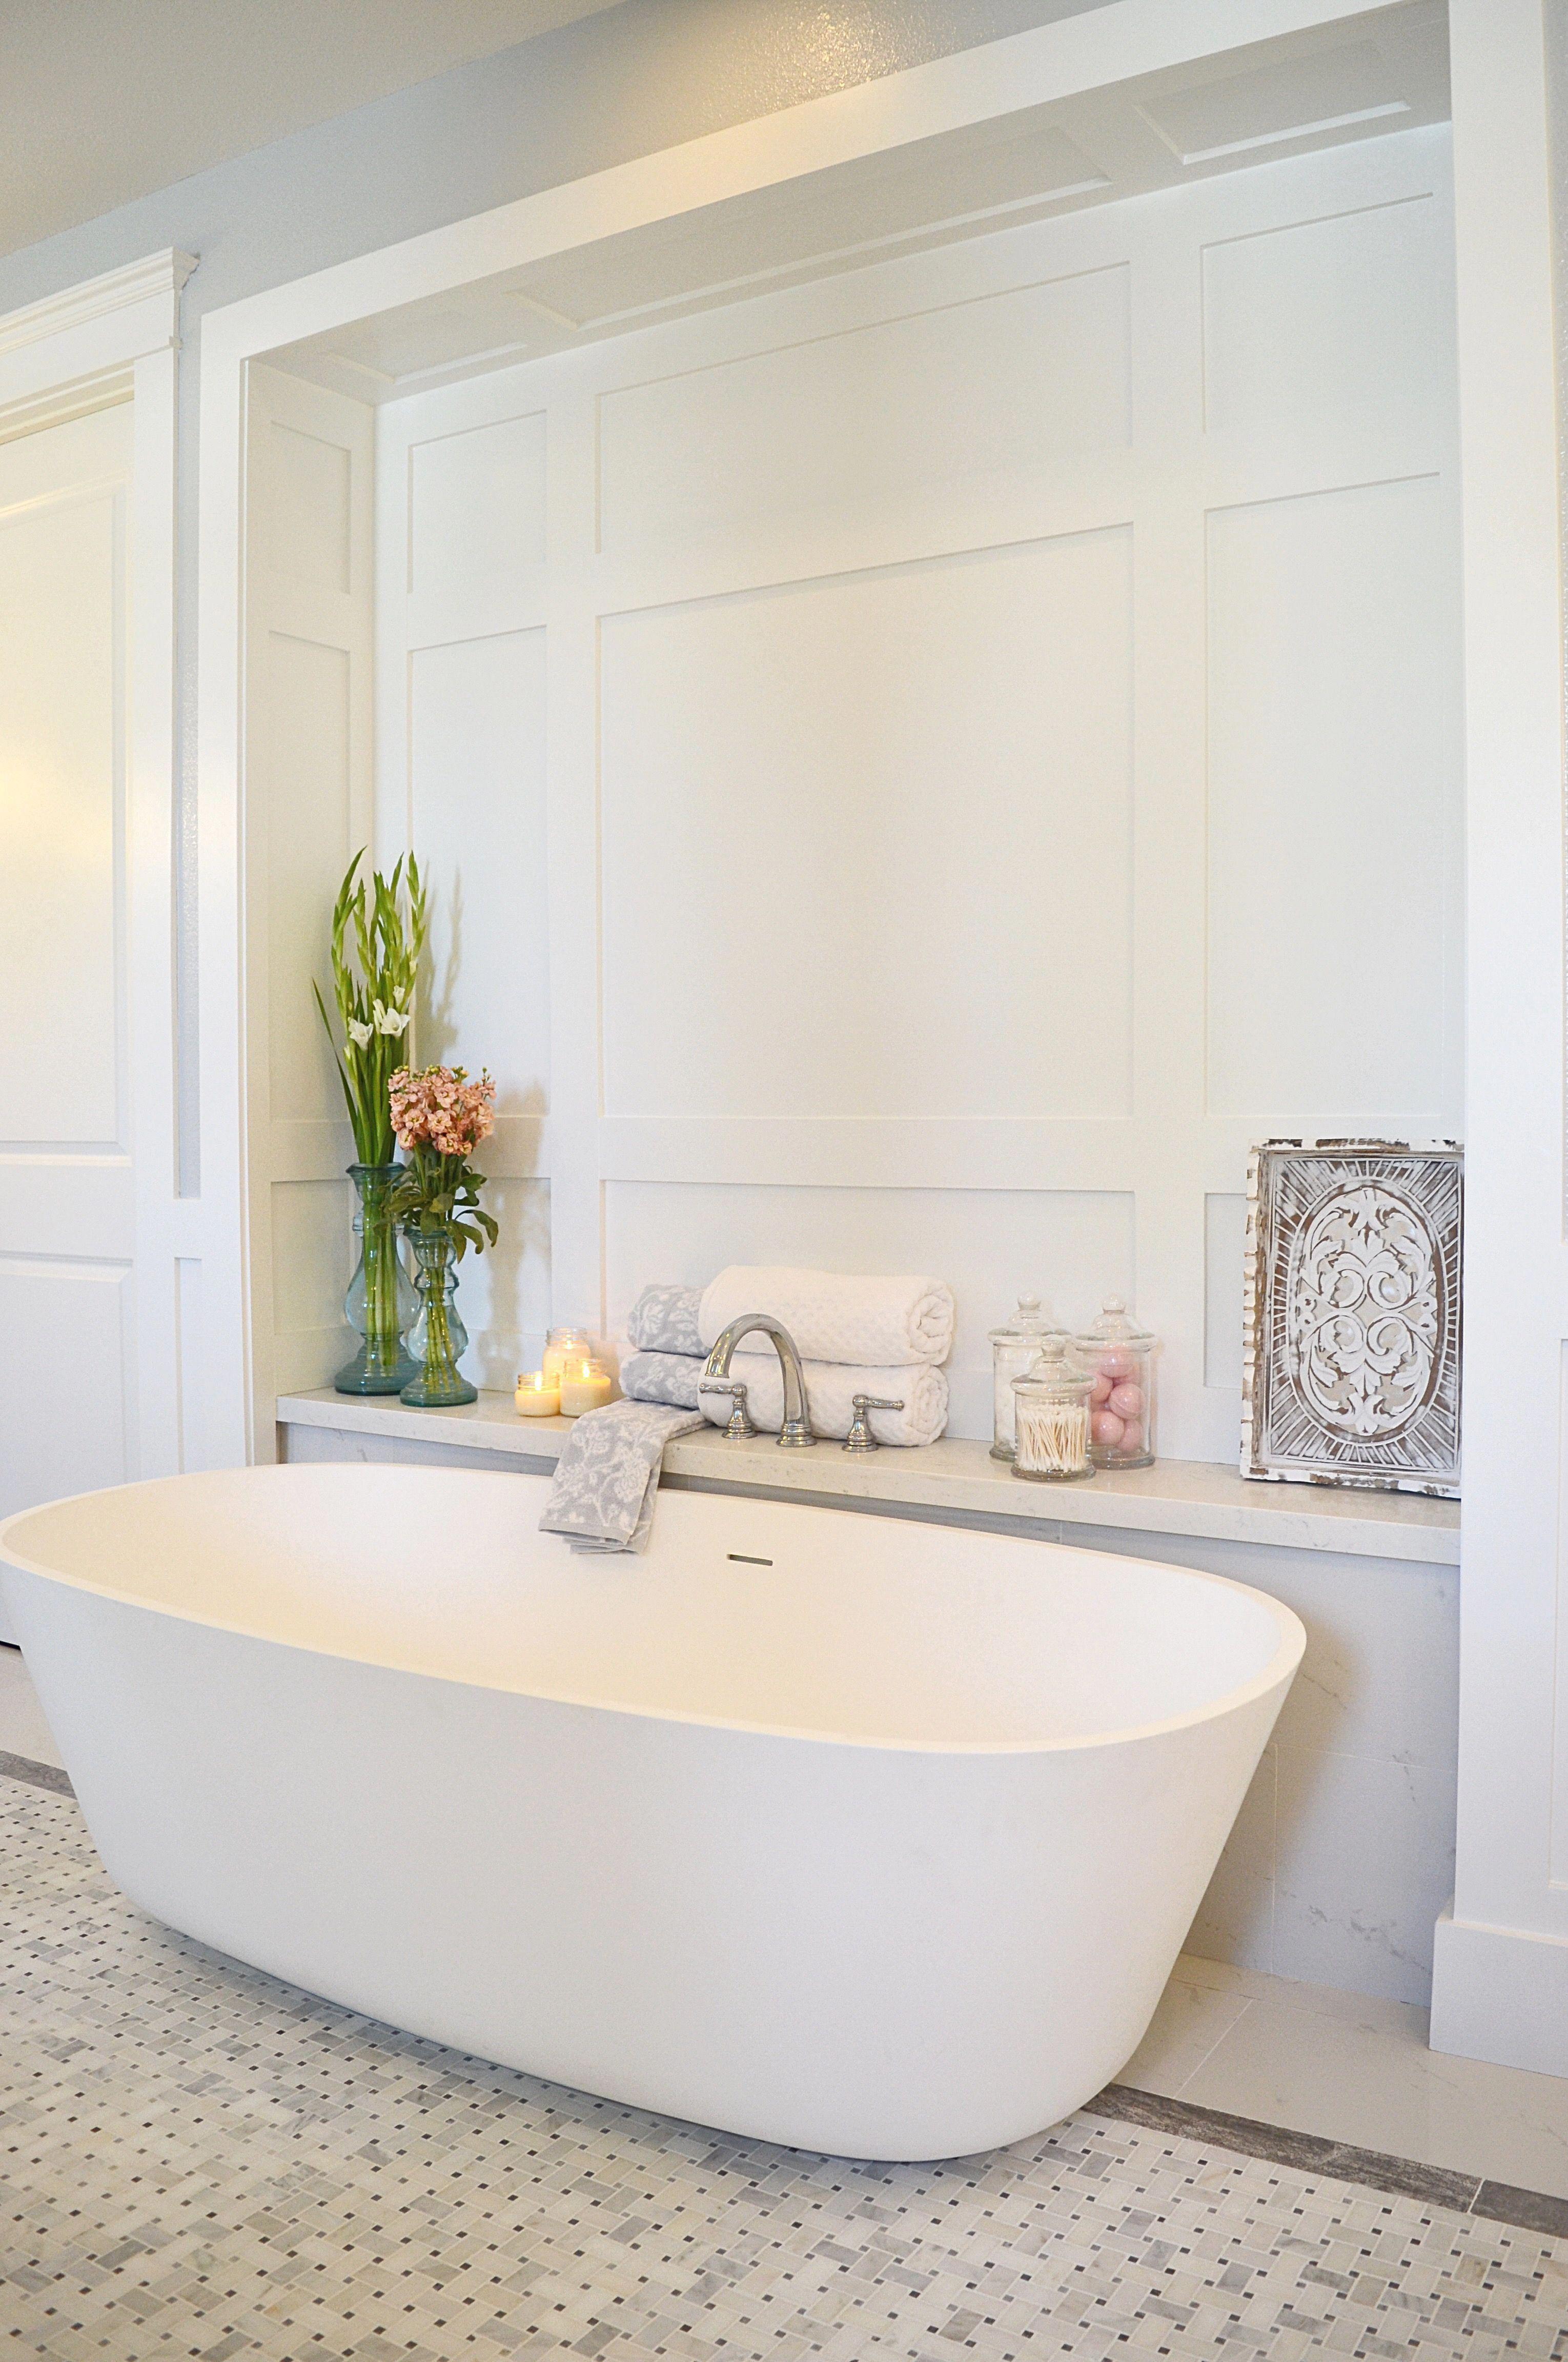 Detachable Tub Hose Sprayer Bathroom Faucets Faucet Diy Bathtub